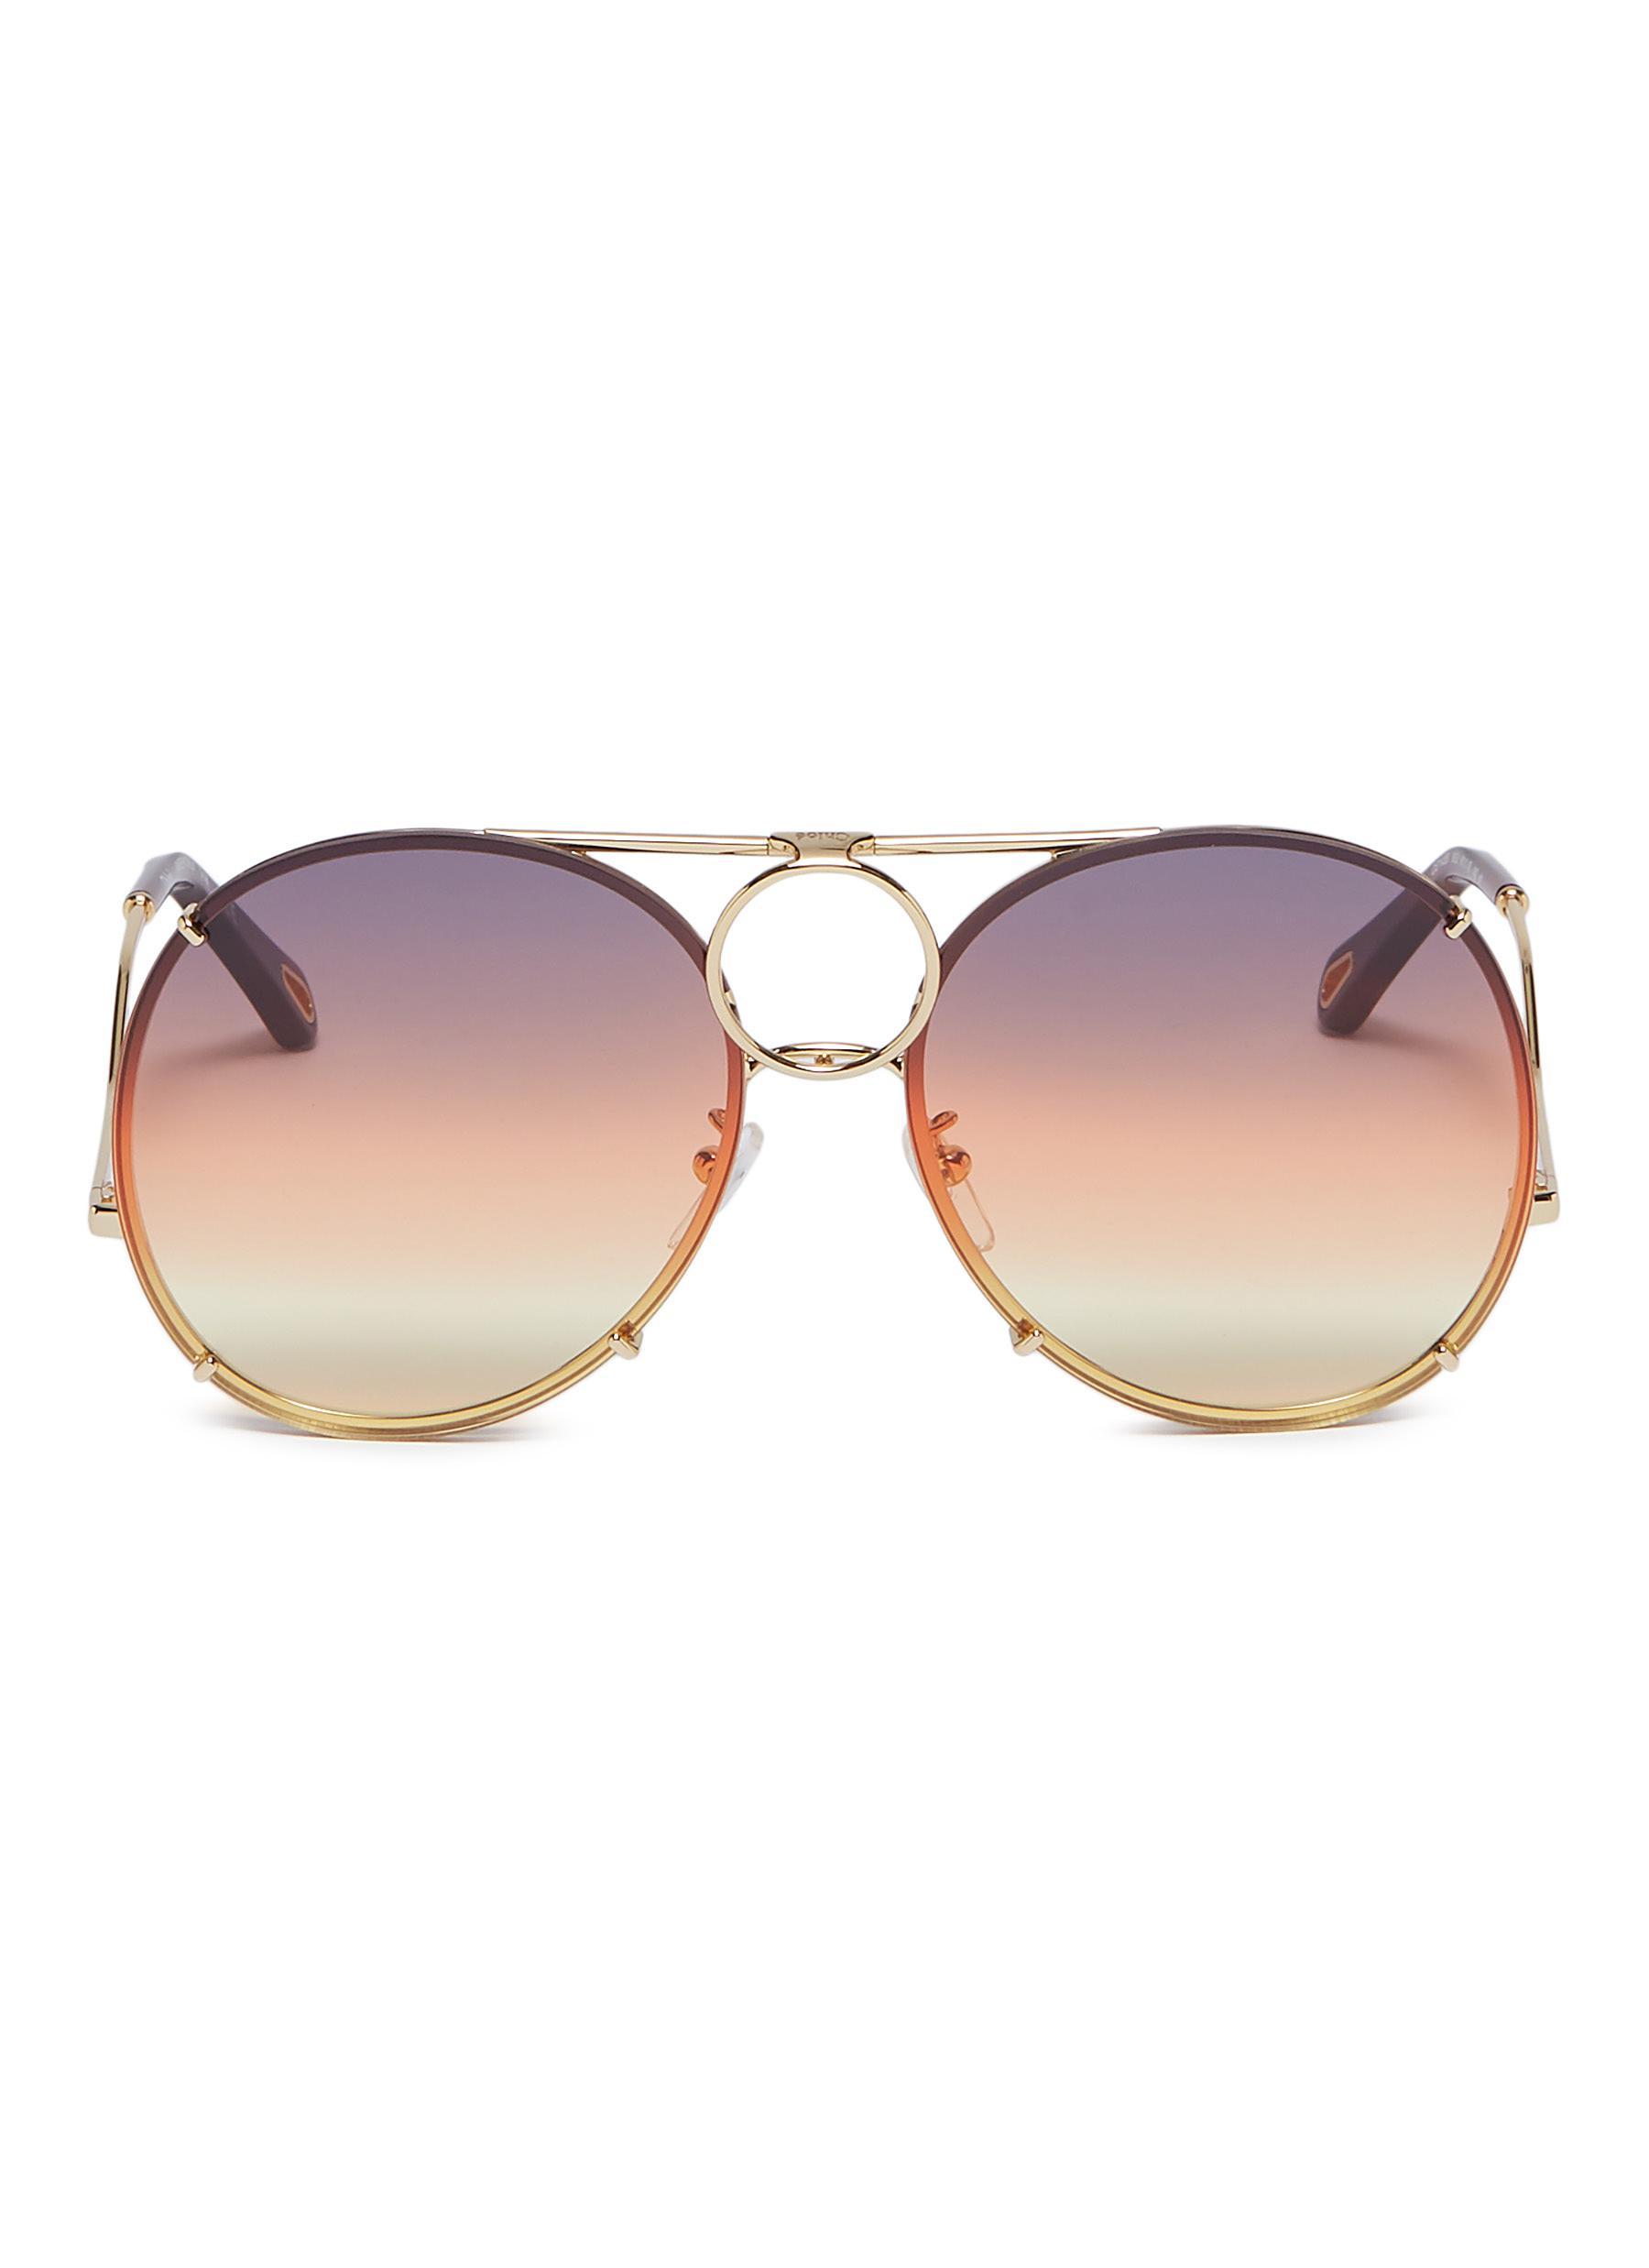 5bc1d672ec1 Chloé.  Vicky  interchangeable lenses metal aviator sunglasses